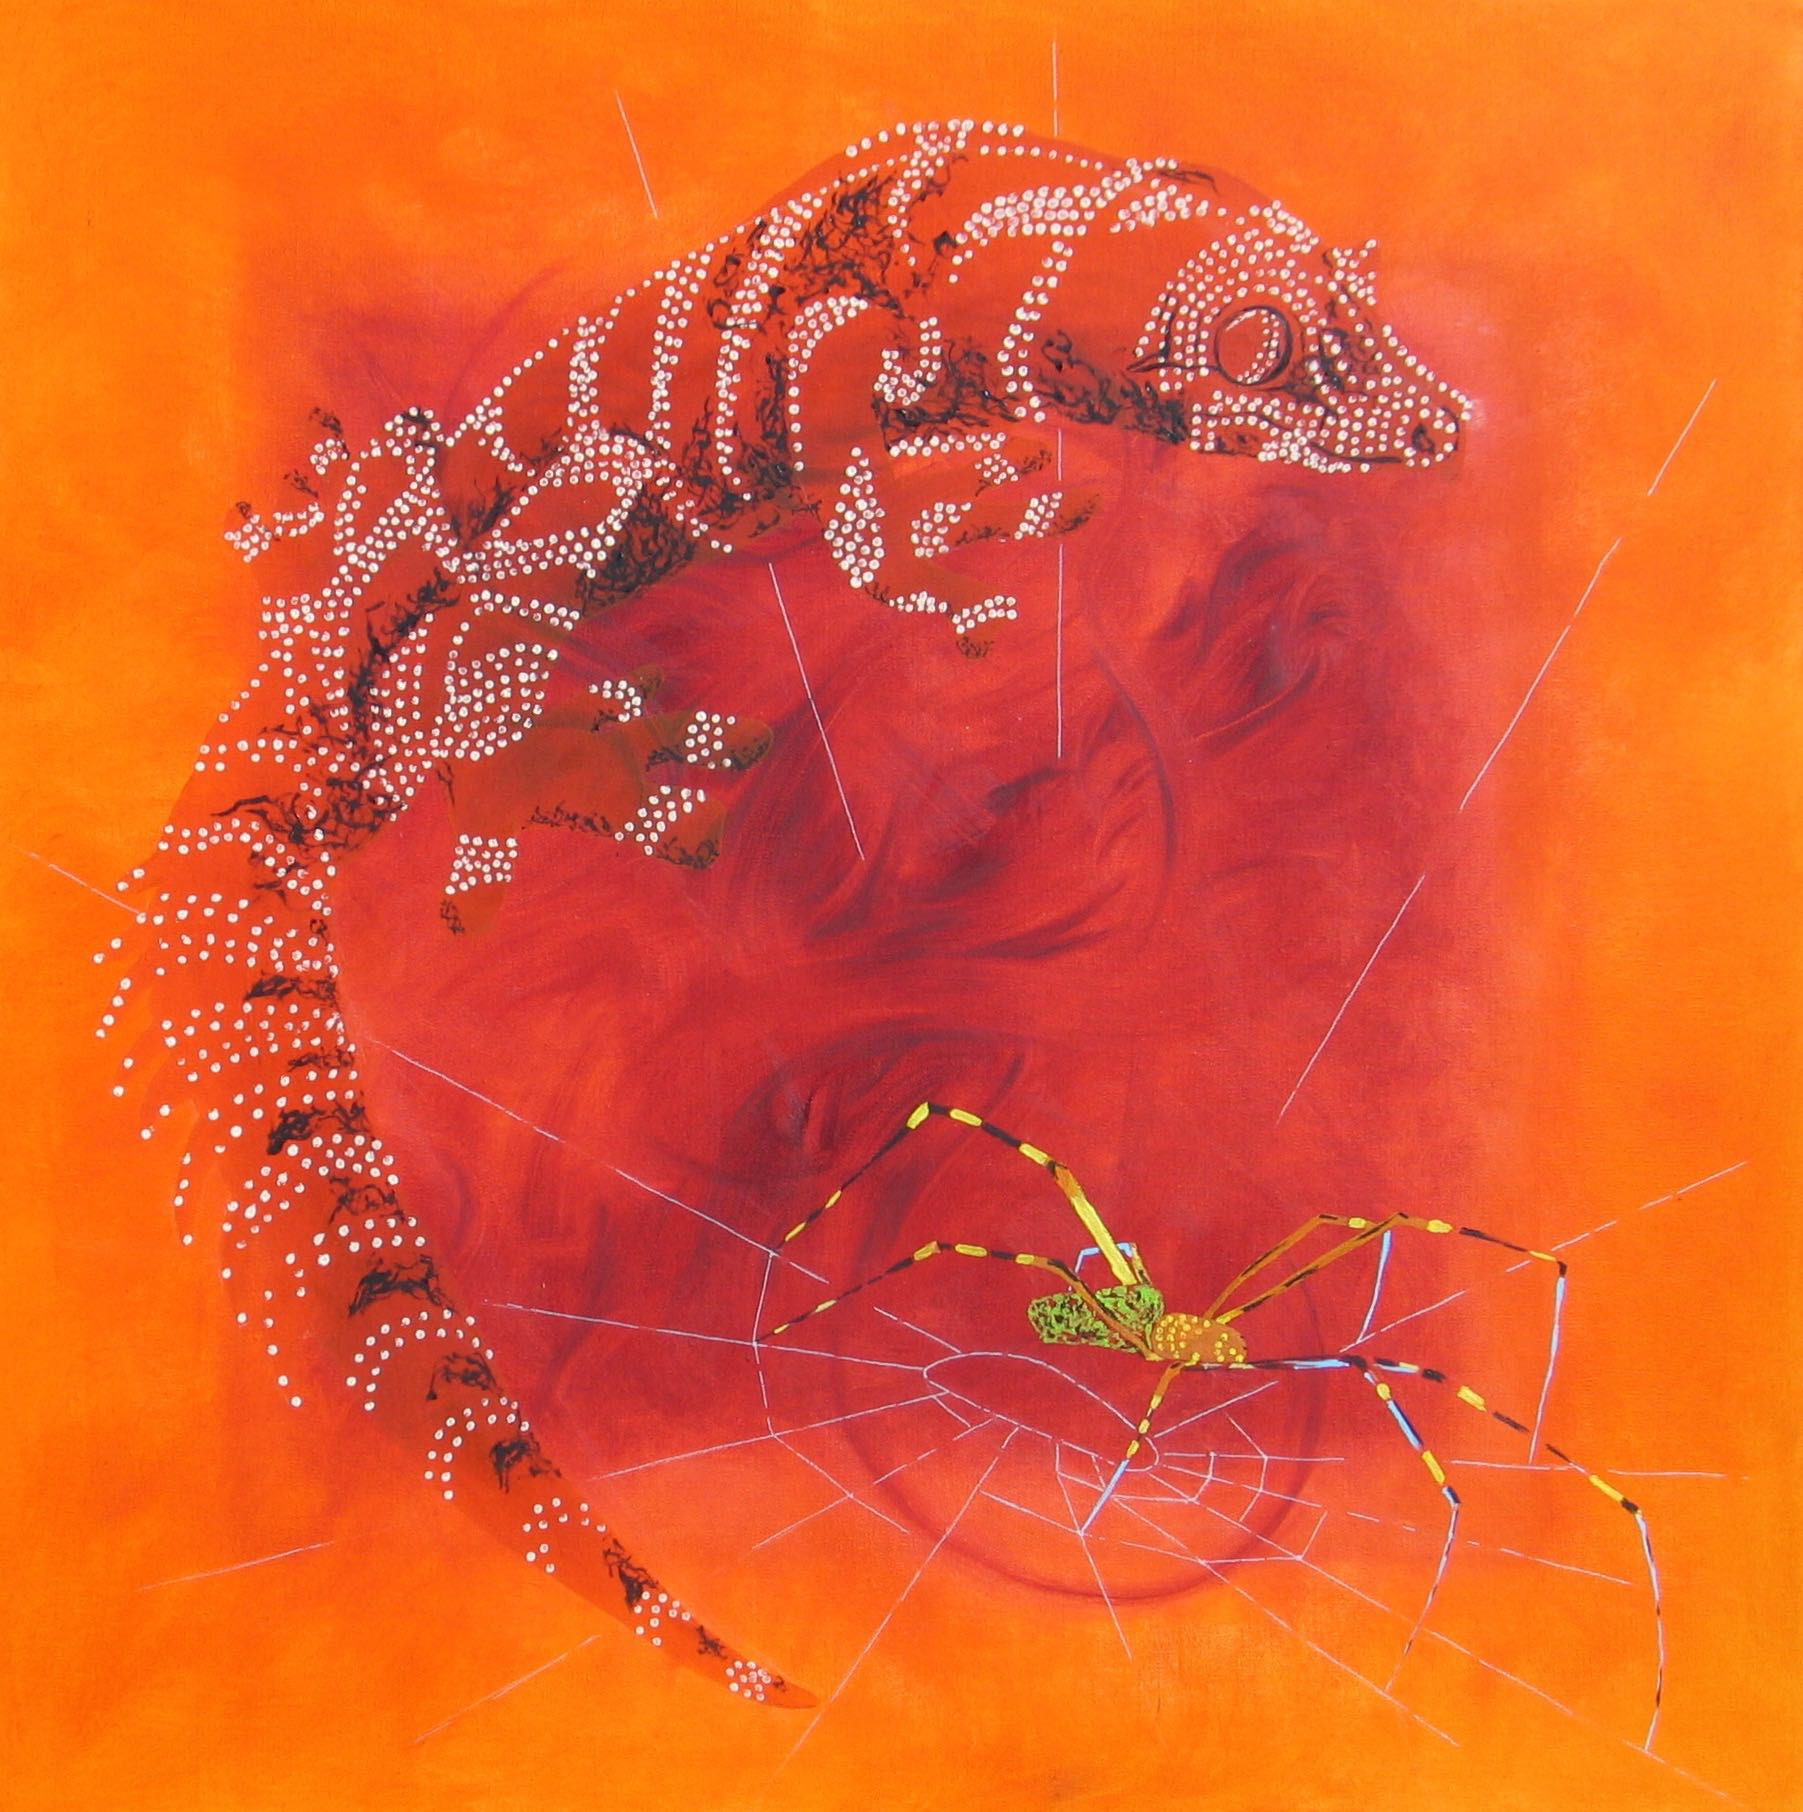 I'm Goanna : 92 X 92 cm oil on canvas